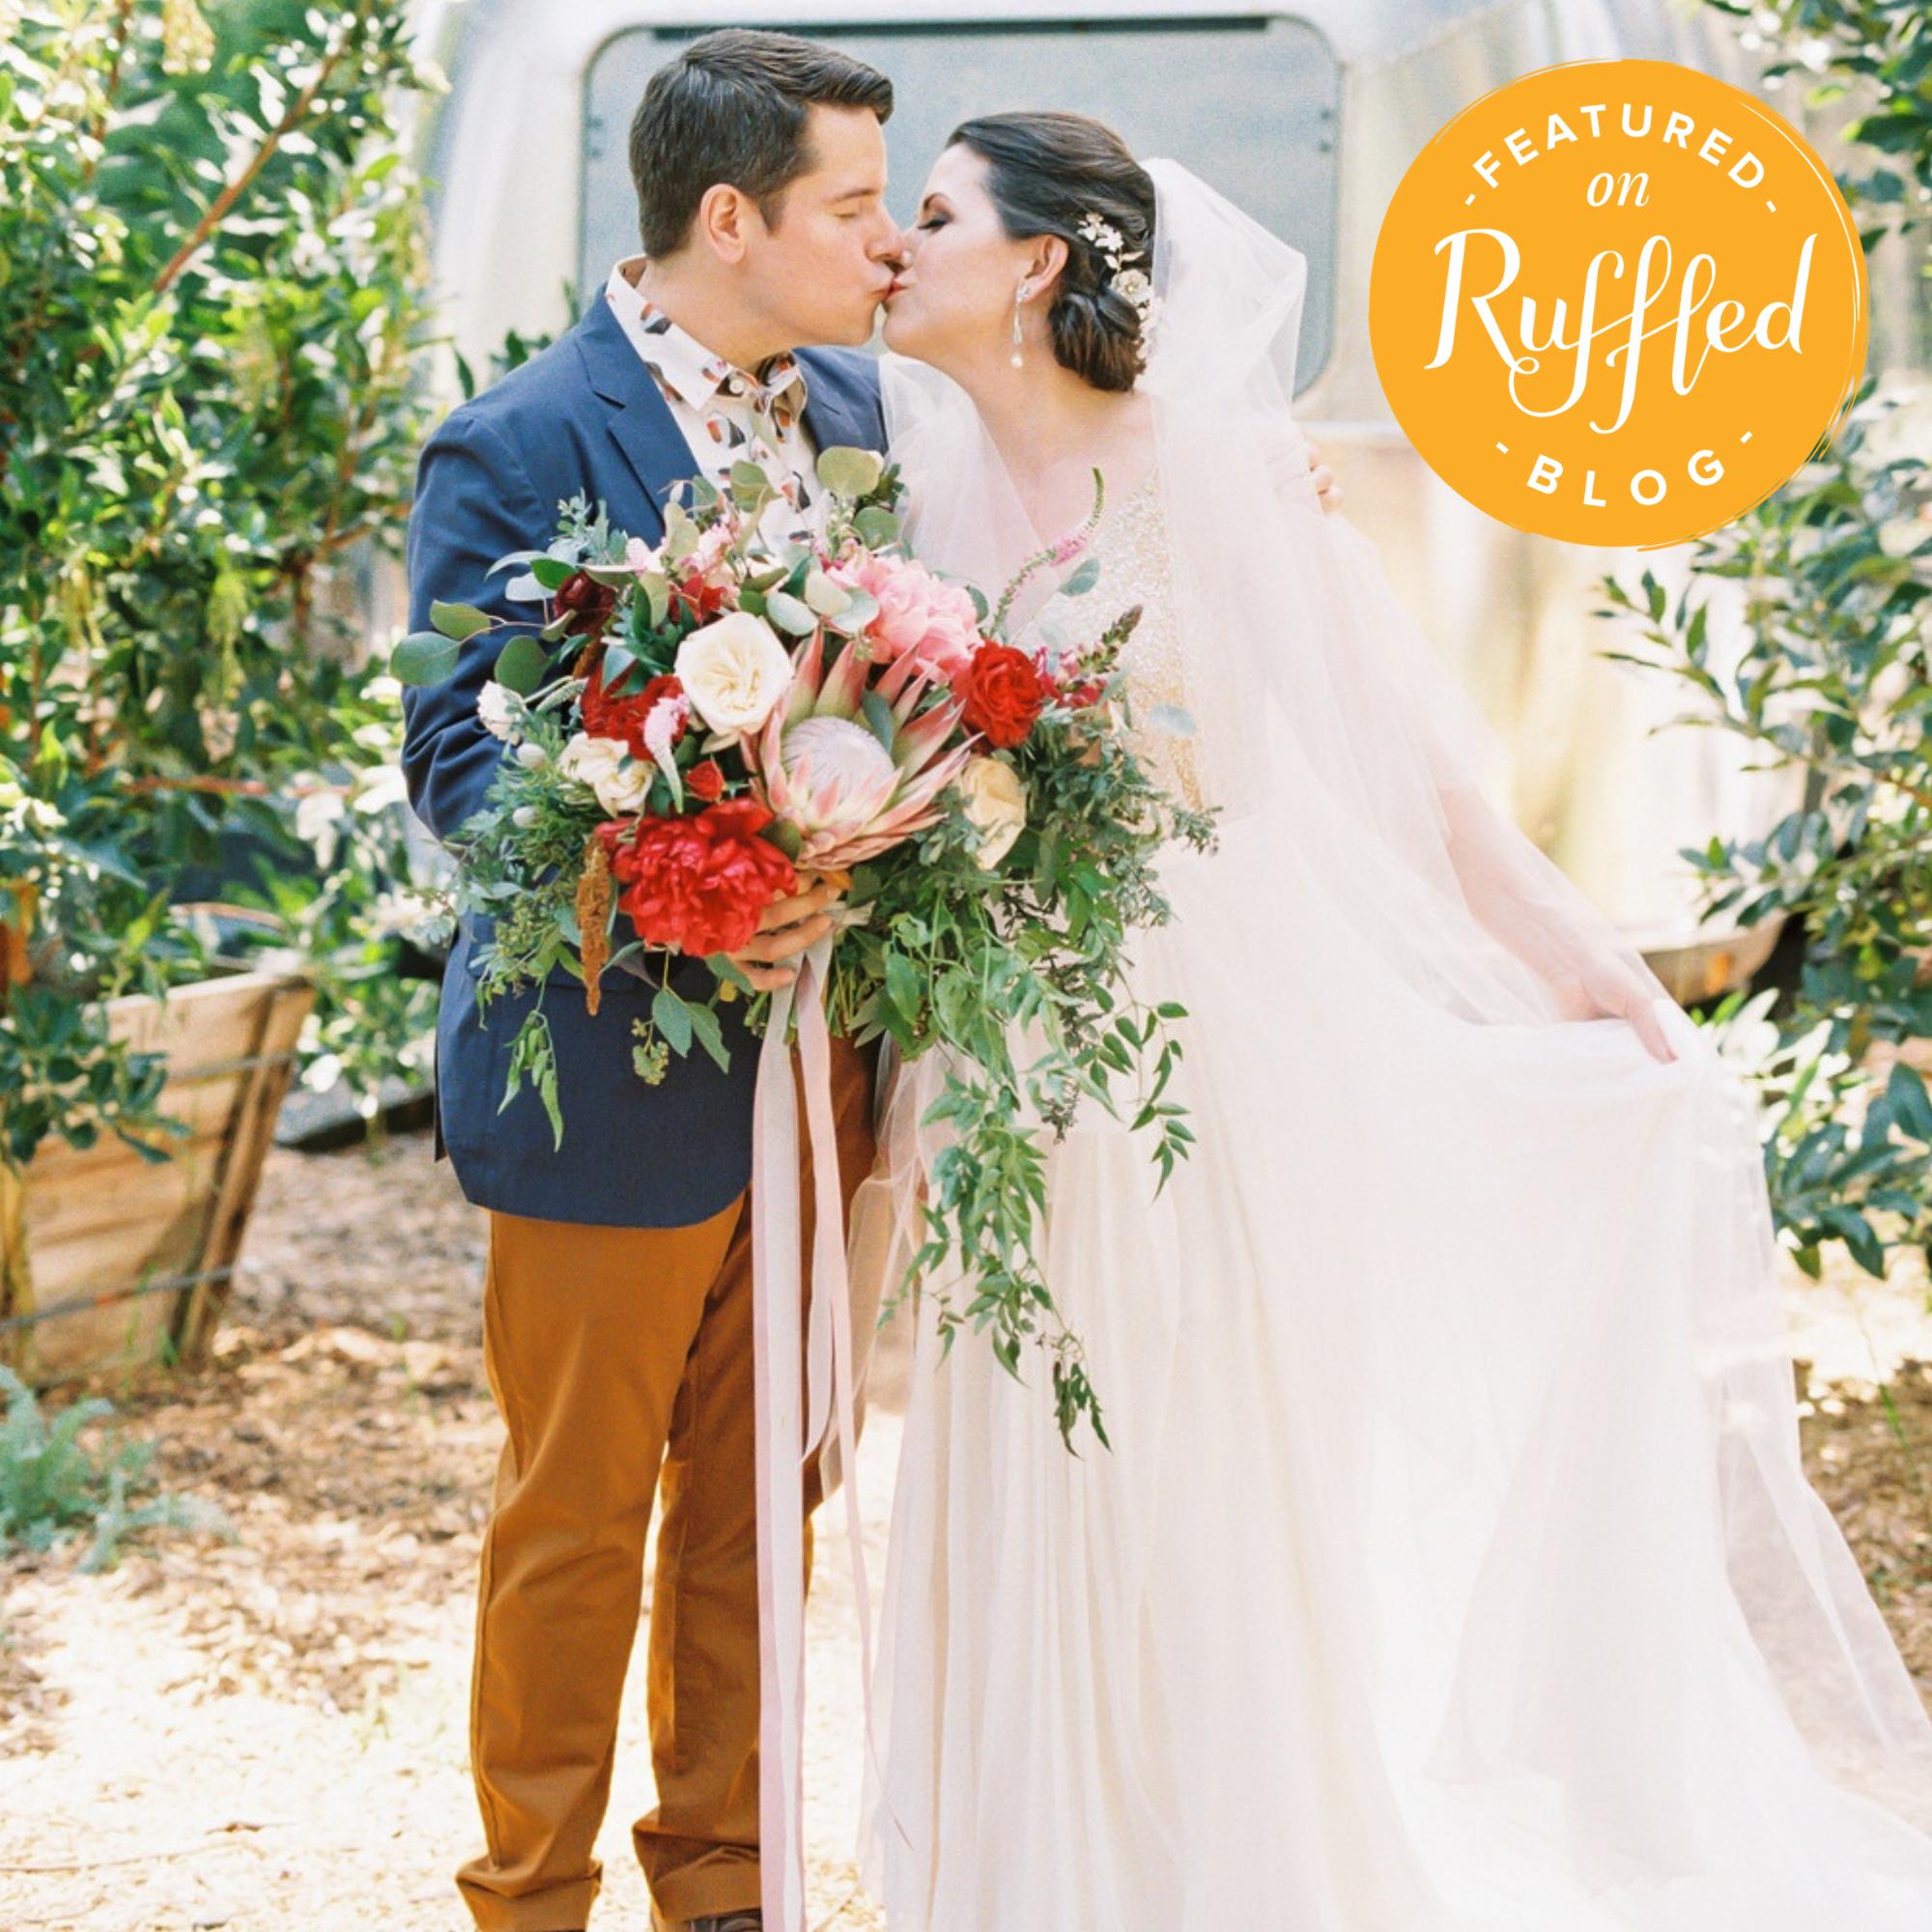 burlap-bordeaux-ruffled-blog-redwoods-wedding.png